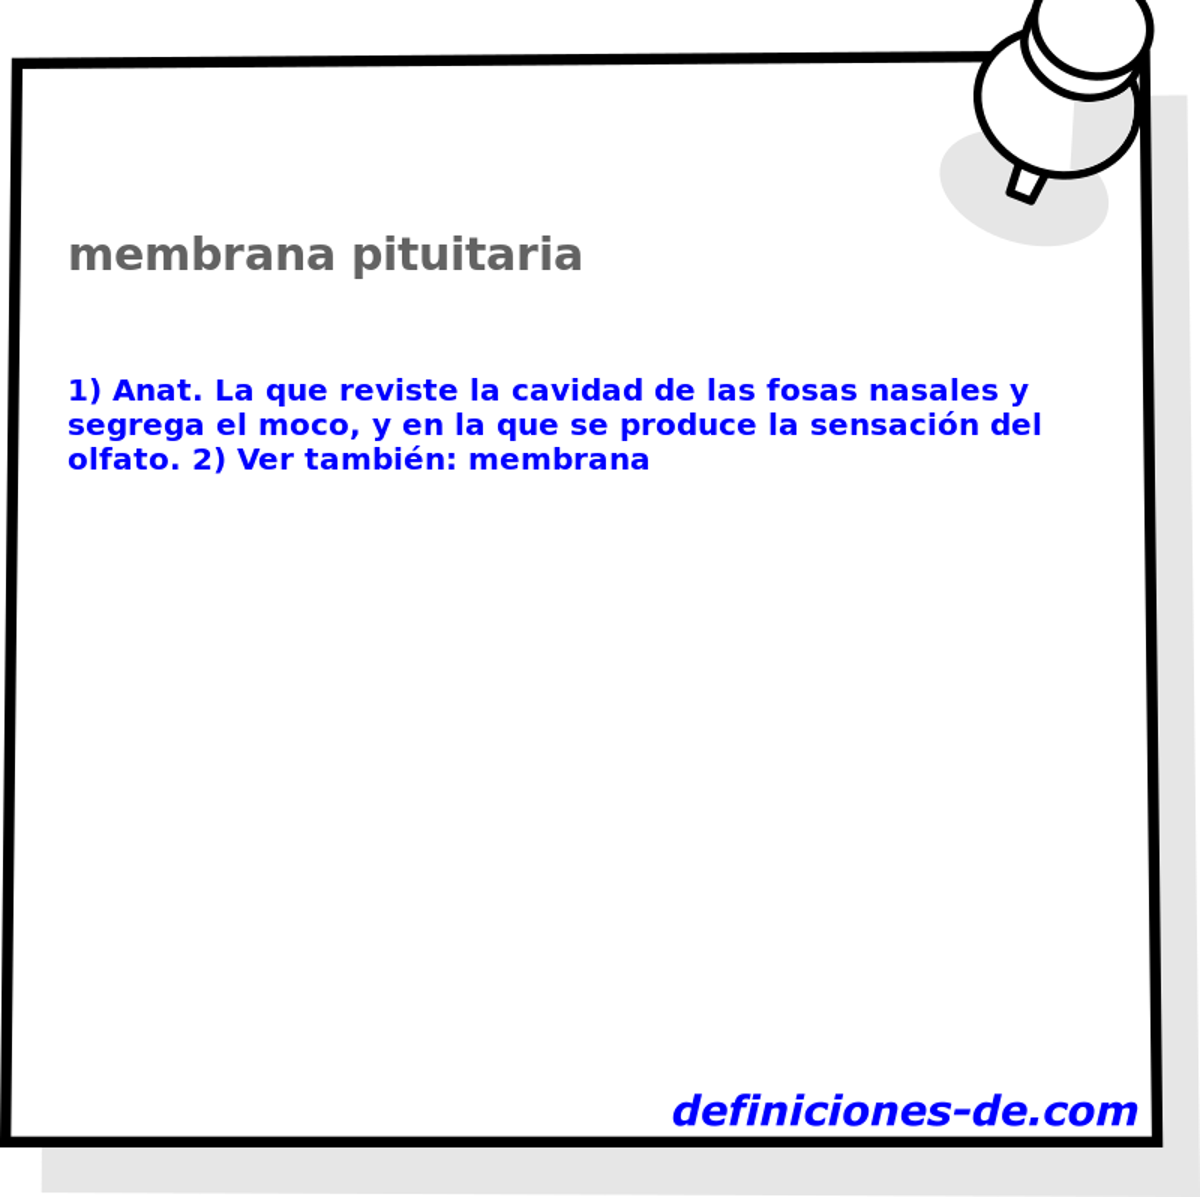 Qué significa Membrana pituitaria?